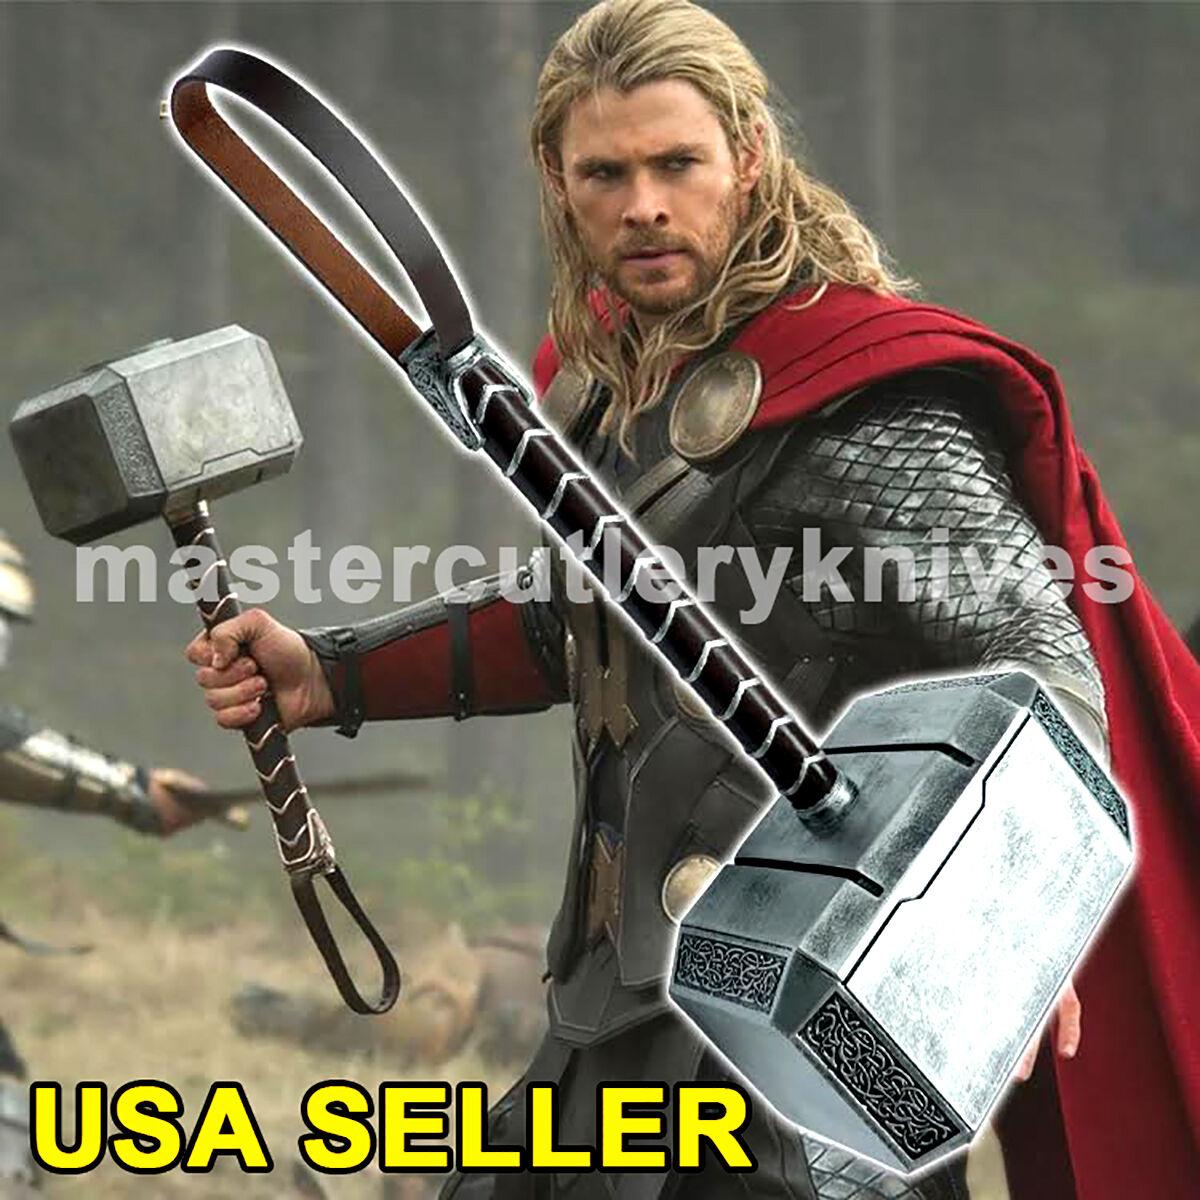 1:1 Scale Full Resin Avengers Thor Hammer 1:1 Replica Prop Mjolnir cosplay USA